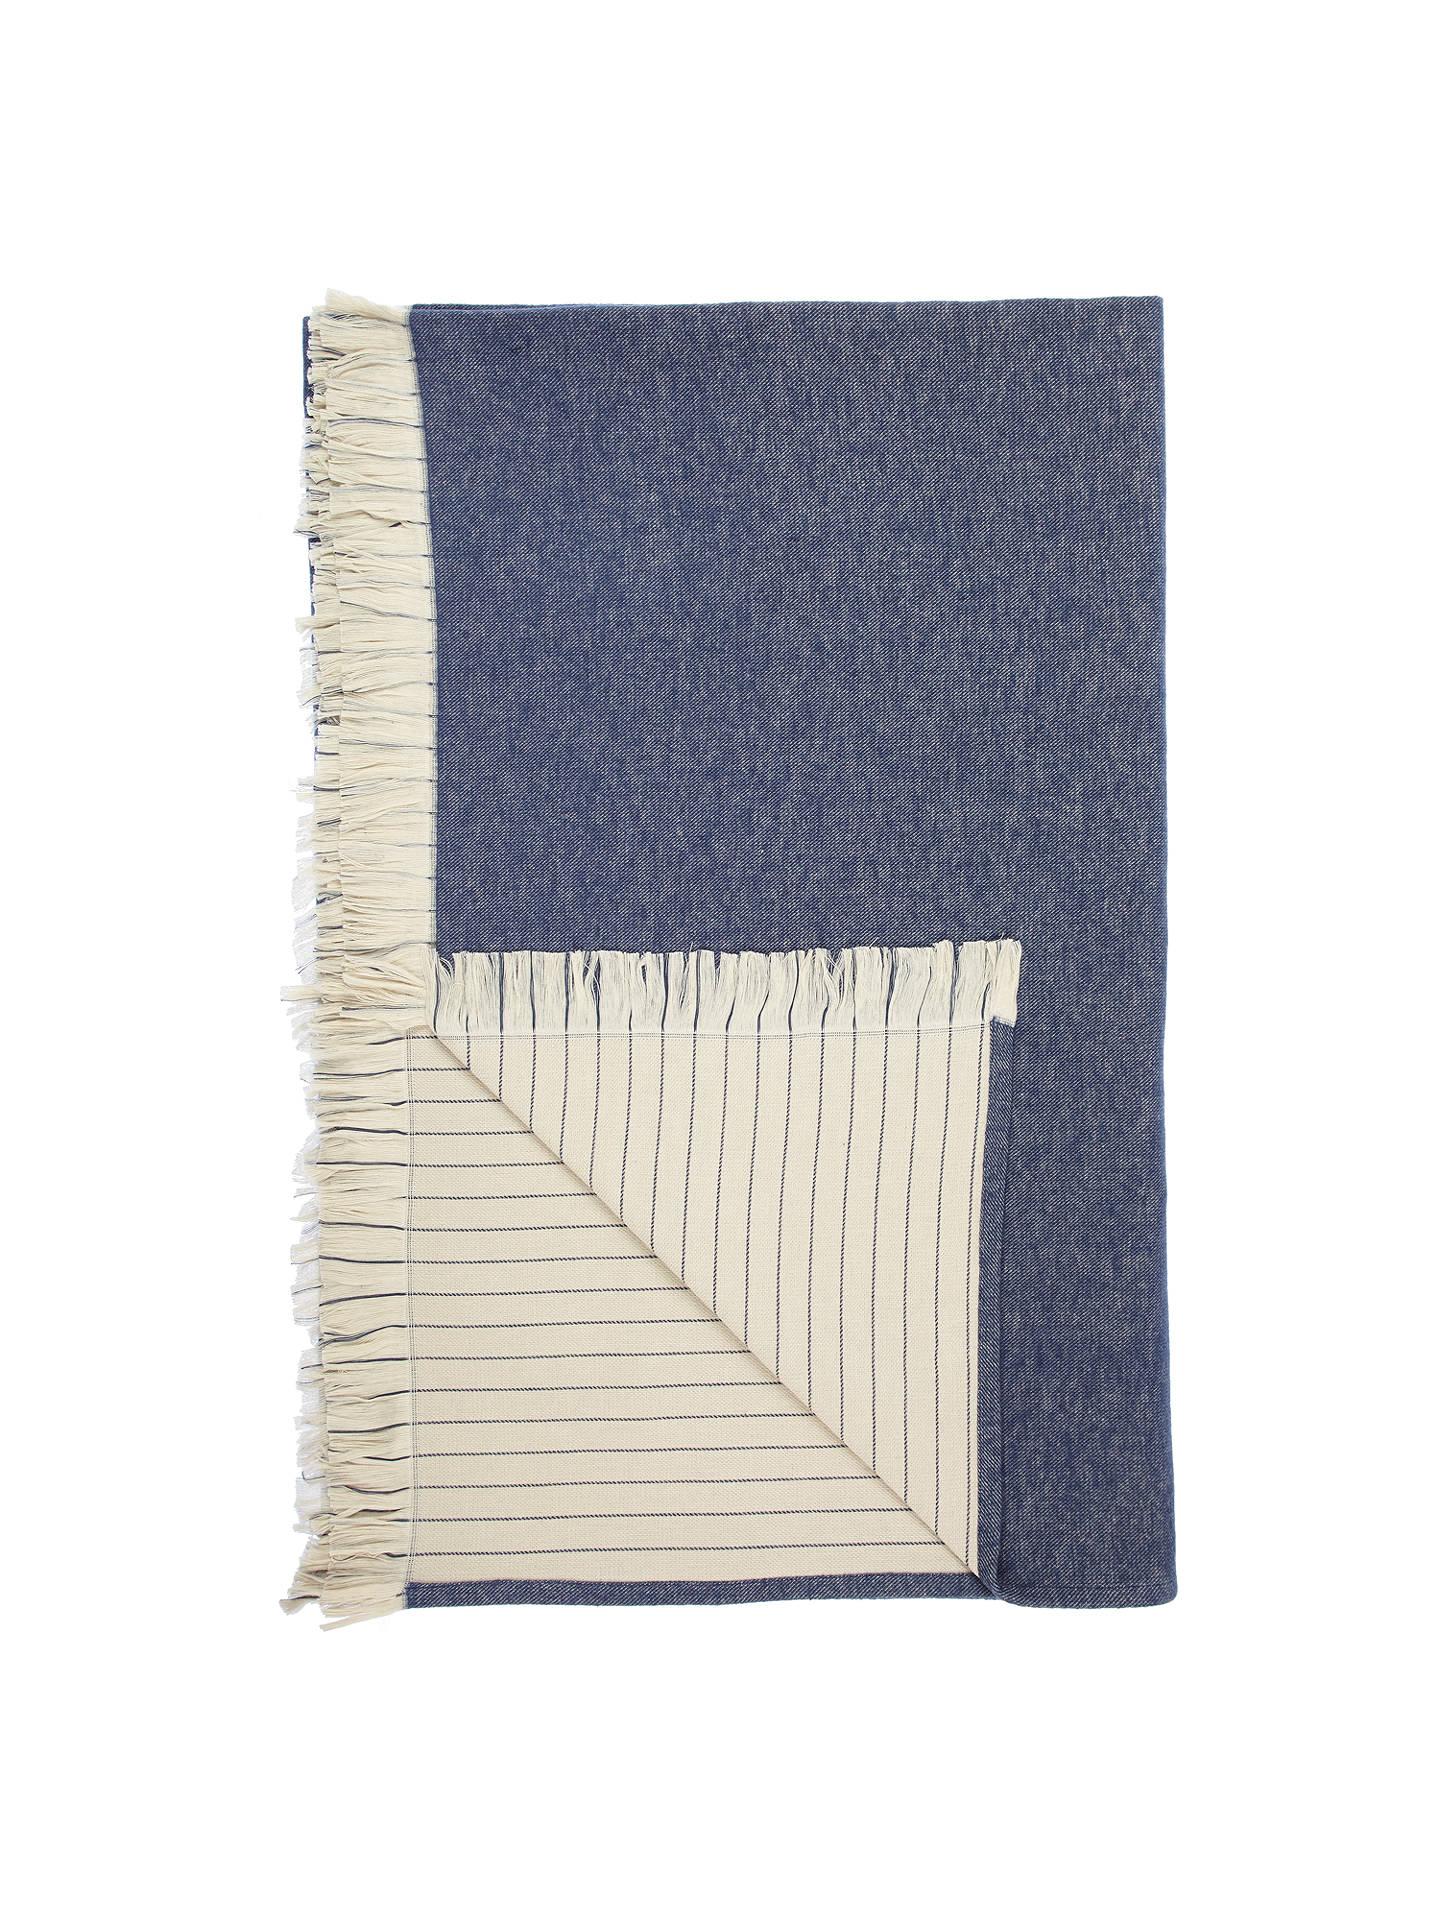 john lewis partners brushed cotton throw at john lewis. Black Bedroom Furniture Sets. Home Design Ideas